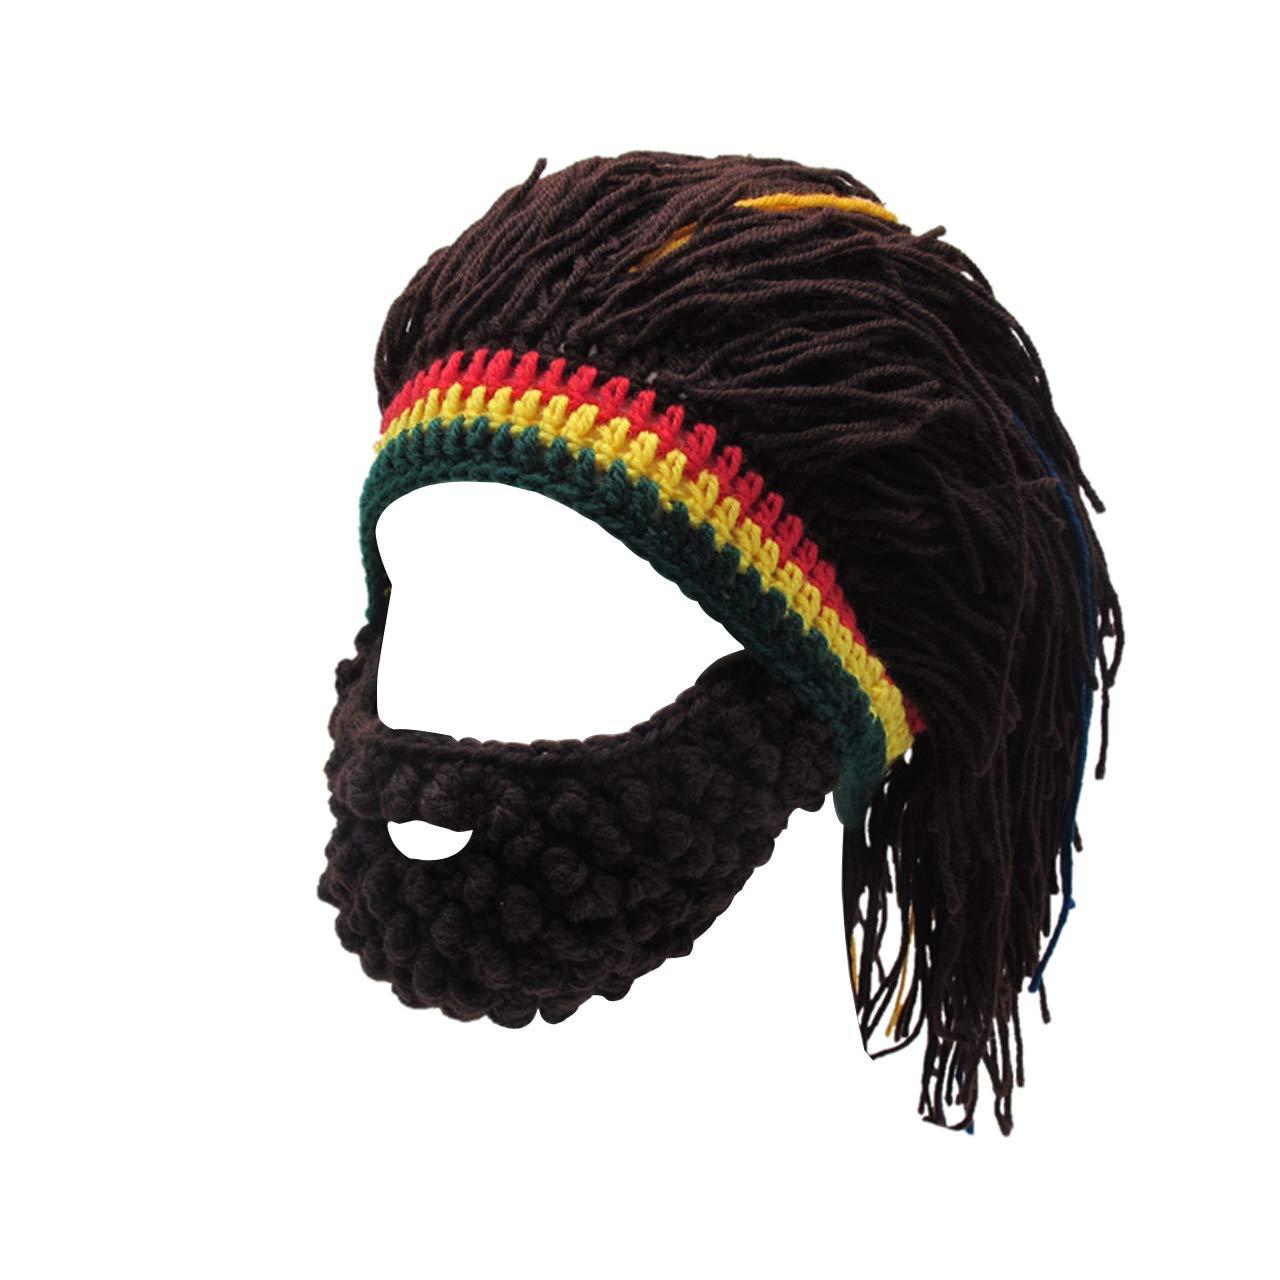 31a918ff0f8 Details about faleto rasta hats funny men women knitted wig beard  rastafarian beanie jpg 1280x1280 Rasta